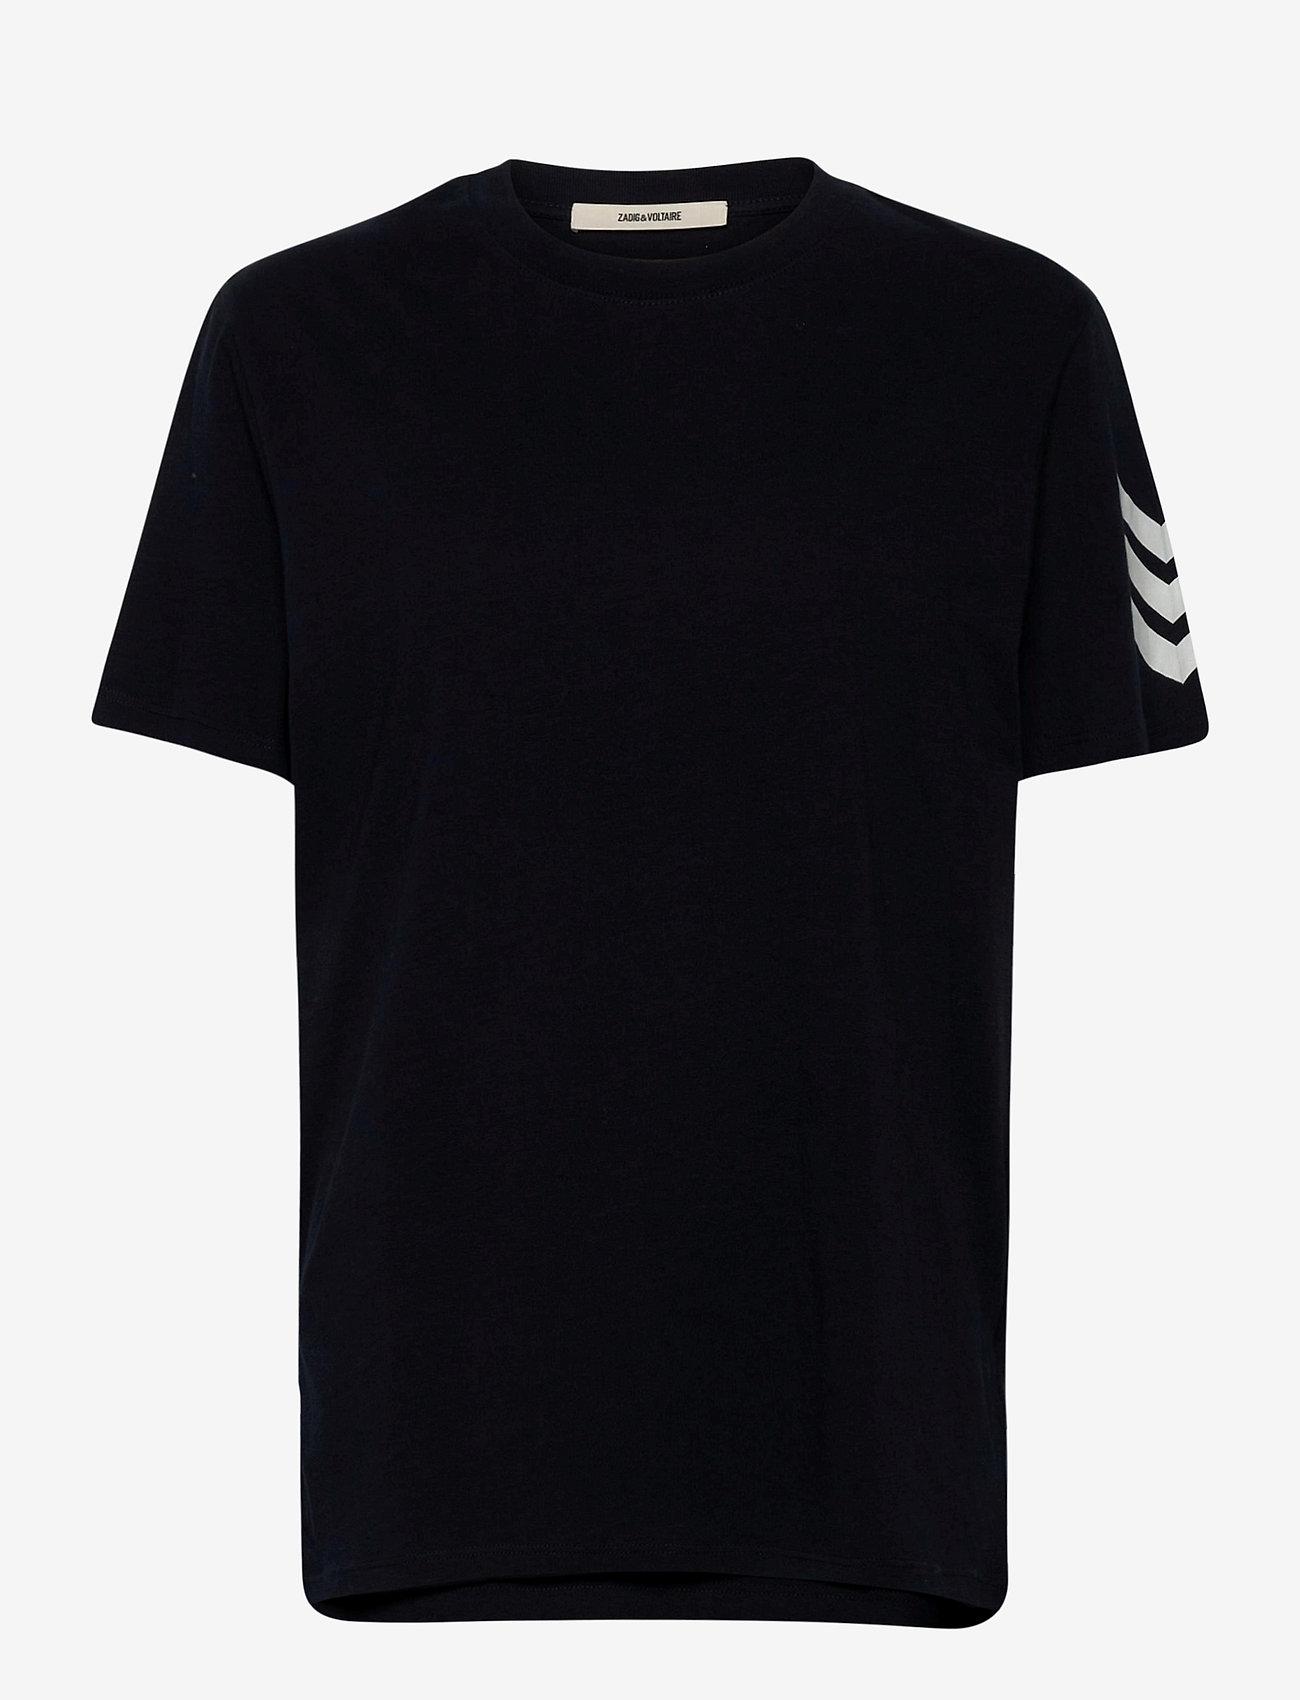 Zadig & Voltaire - TOMMY HC ARROW TEE-SHIRT PRINT ARROW SLEEVE - basic t-shirts - navy blue - 0